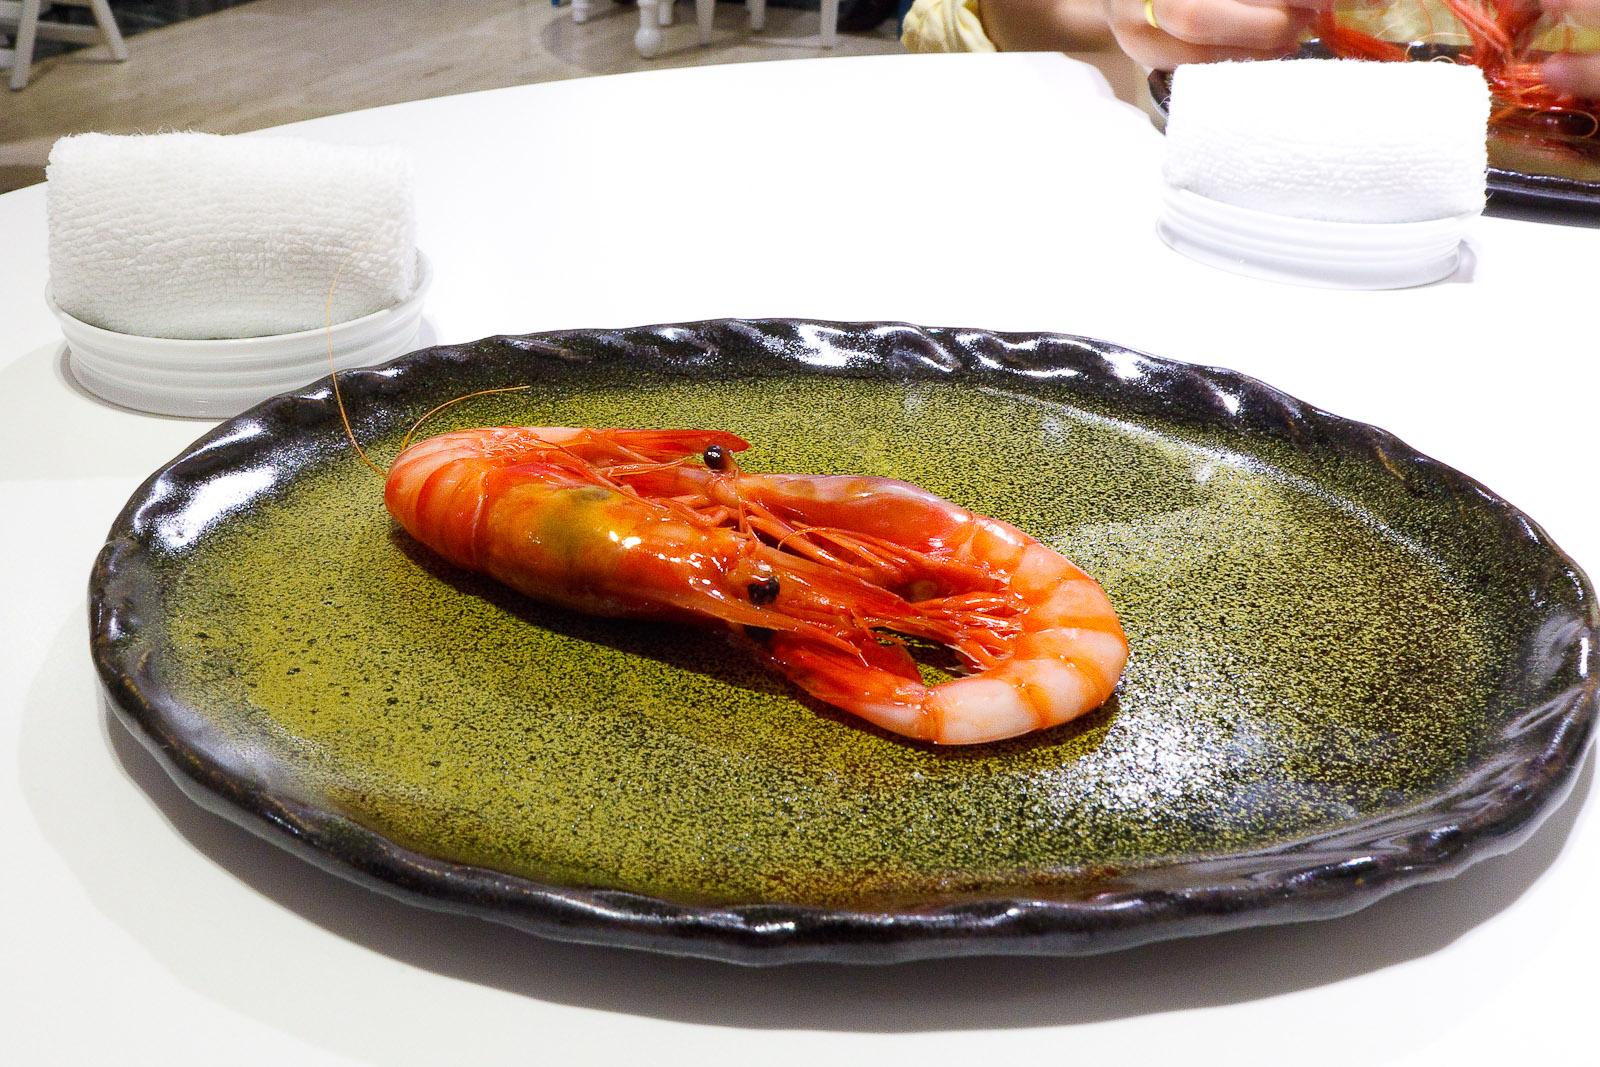 7th Course: Denia bay prawns